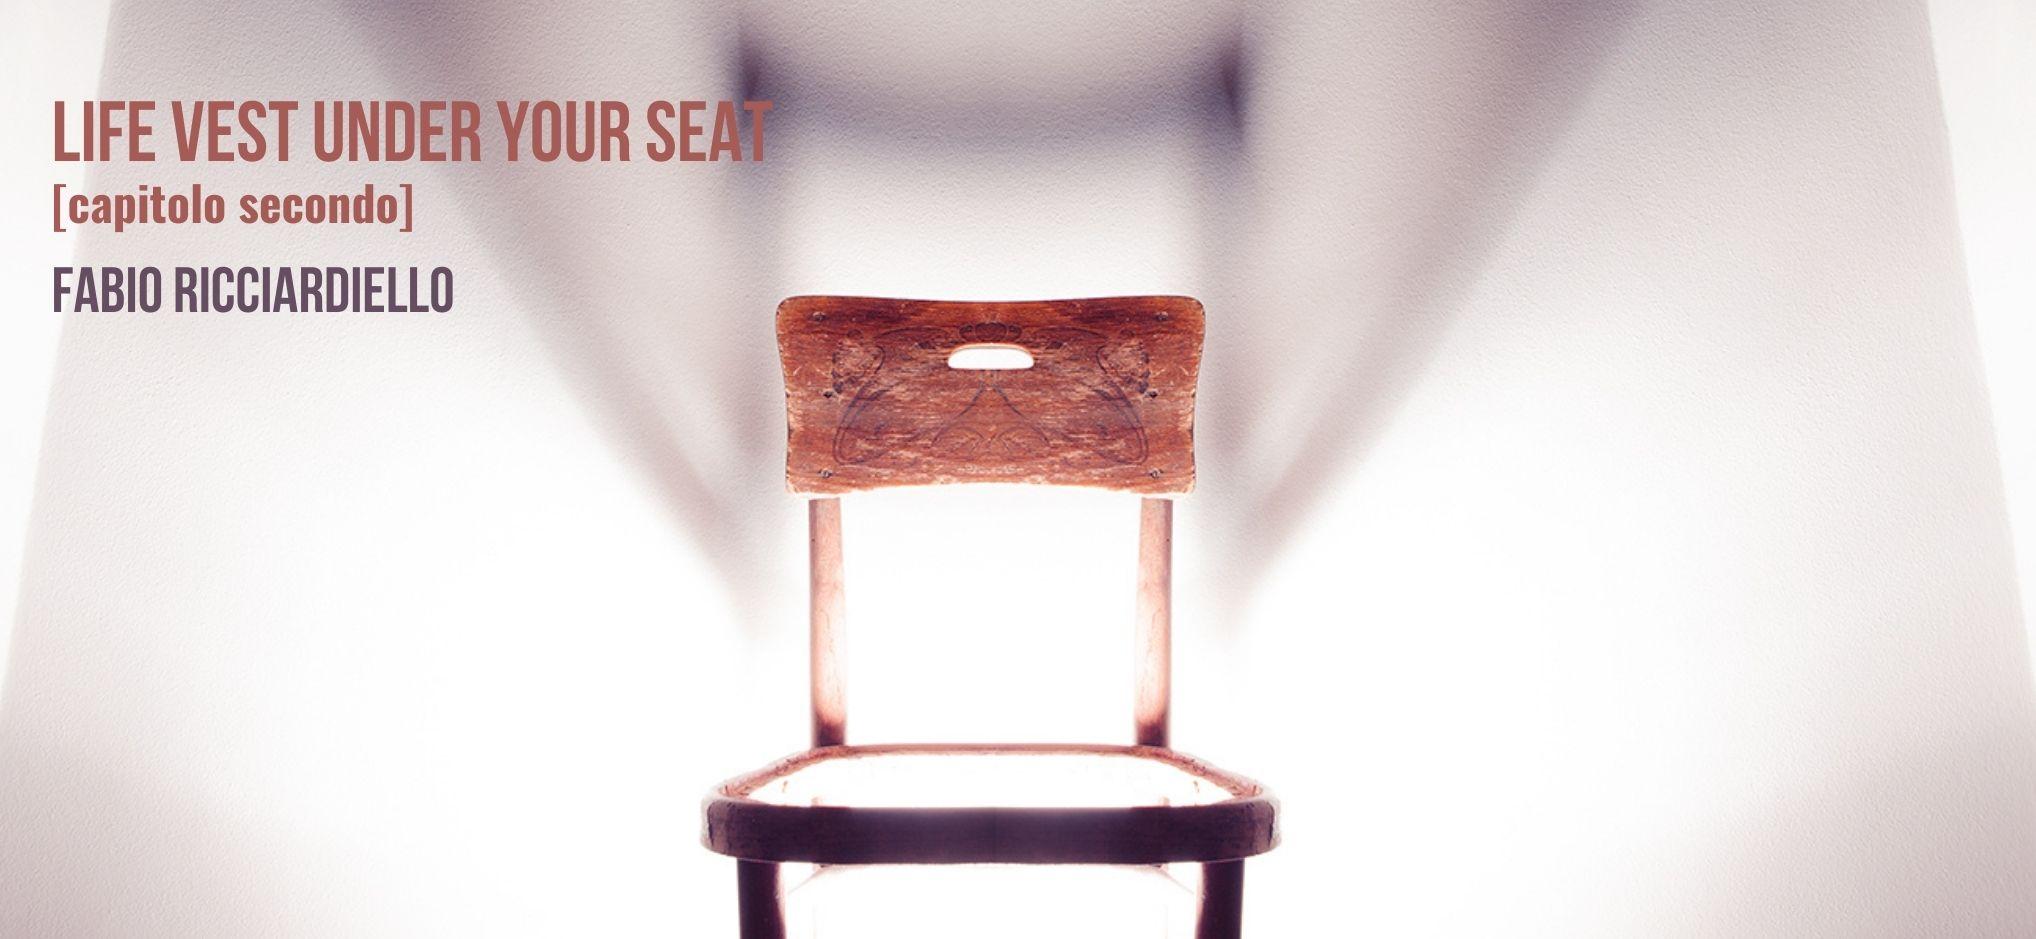 BANNER_Life vest under your seat 2020